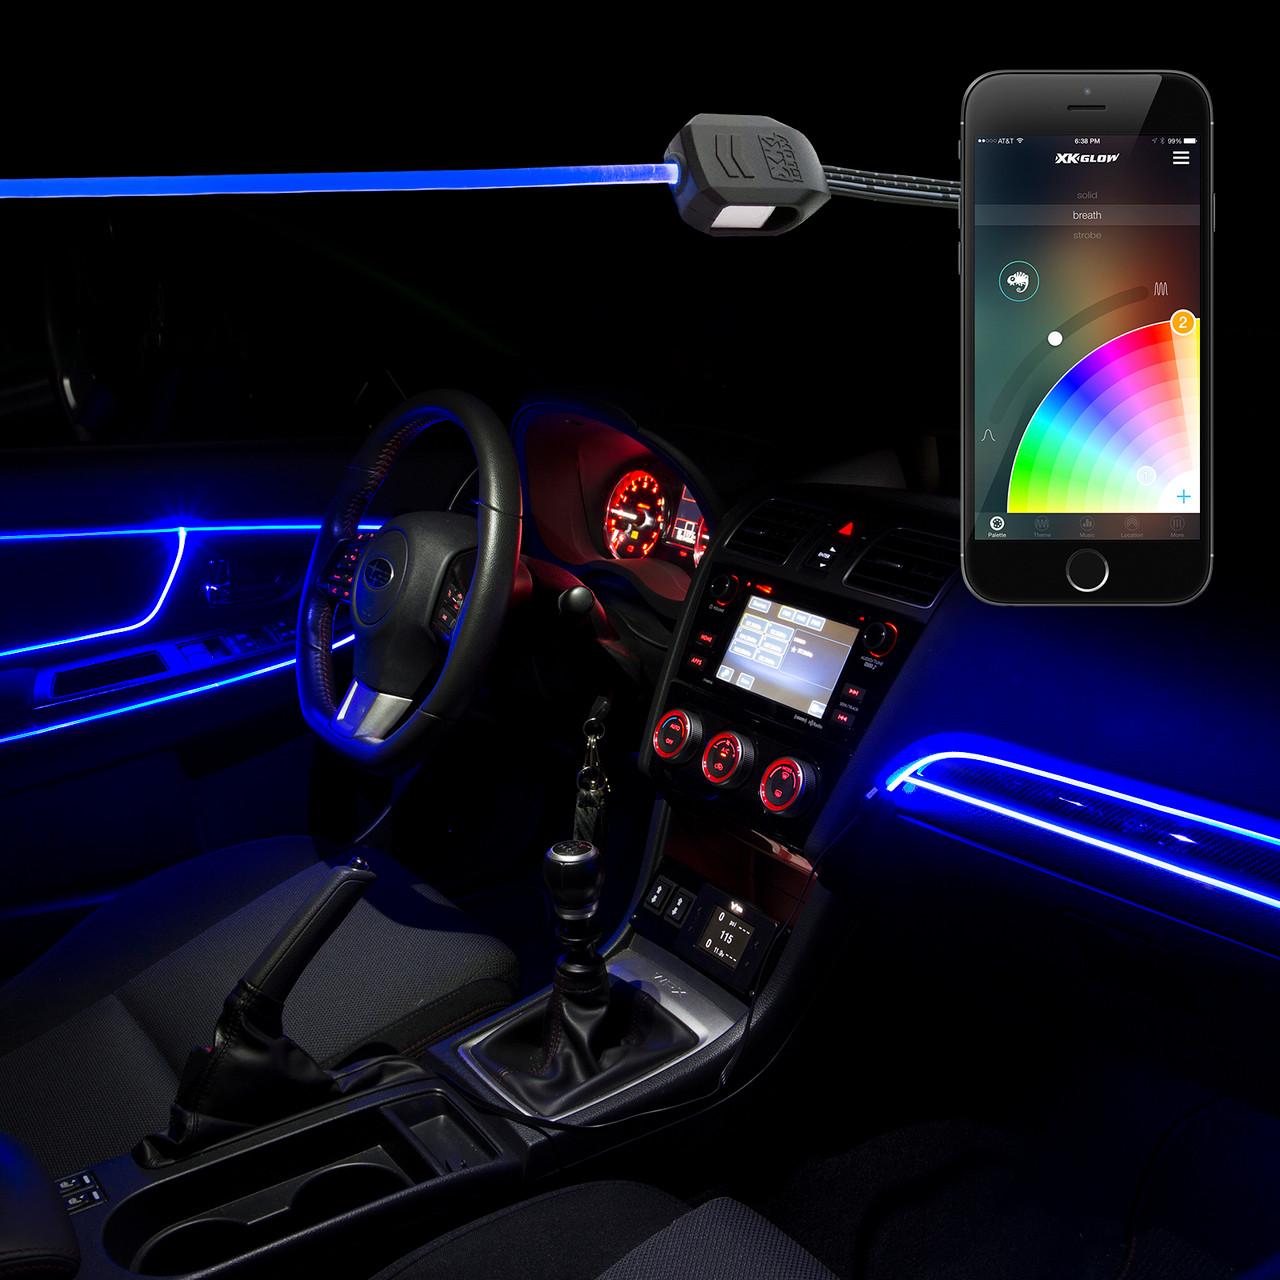 Led Fiber Optic Kits For Cars Xkchrome Smartphone App